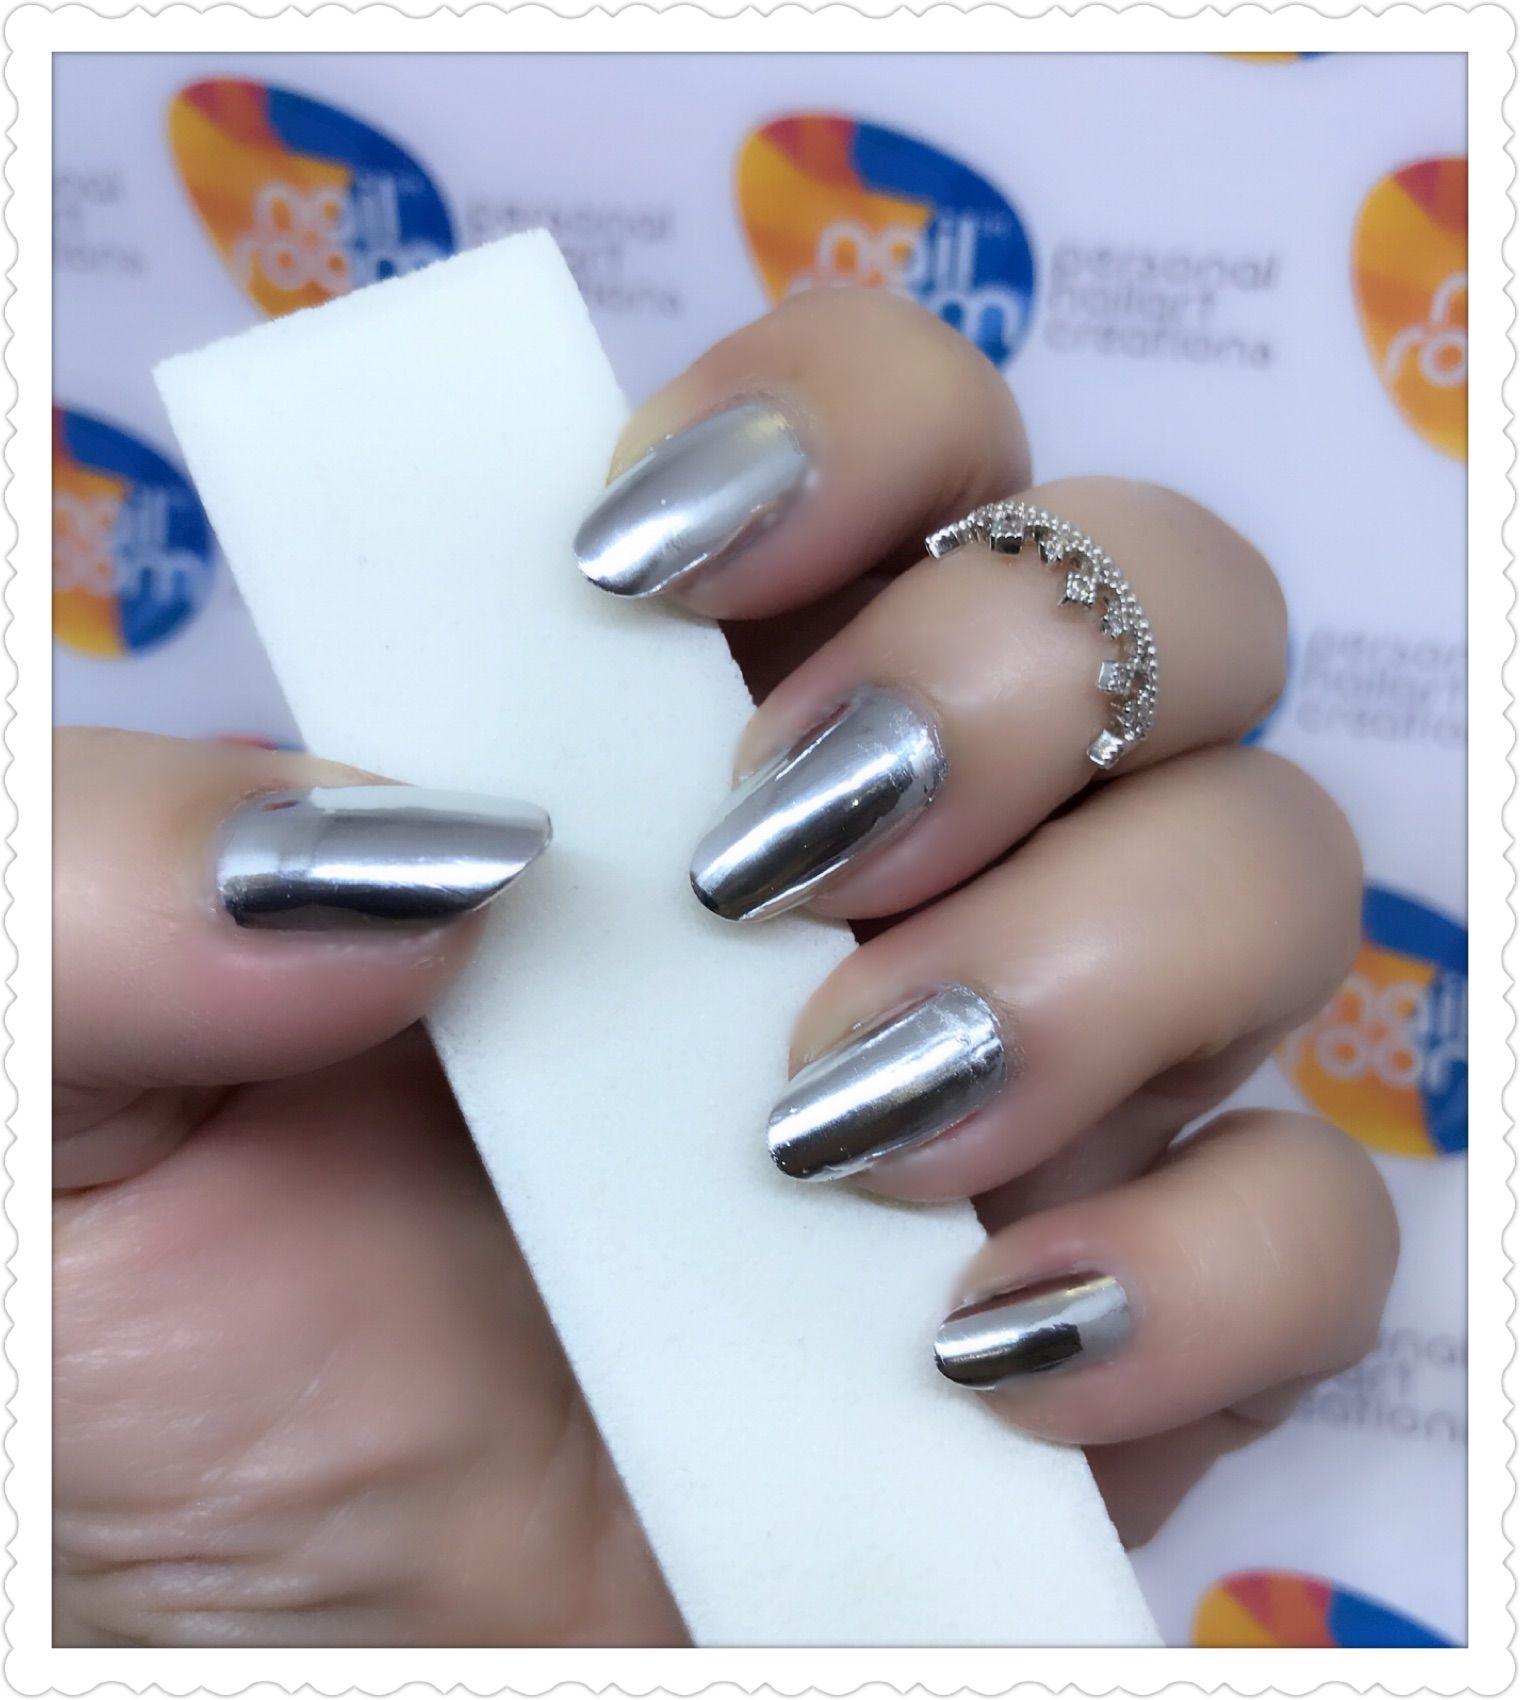 Mirror polish nails. Products used - Born Pretty Mirror Polish | DIY ...